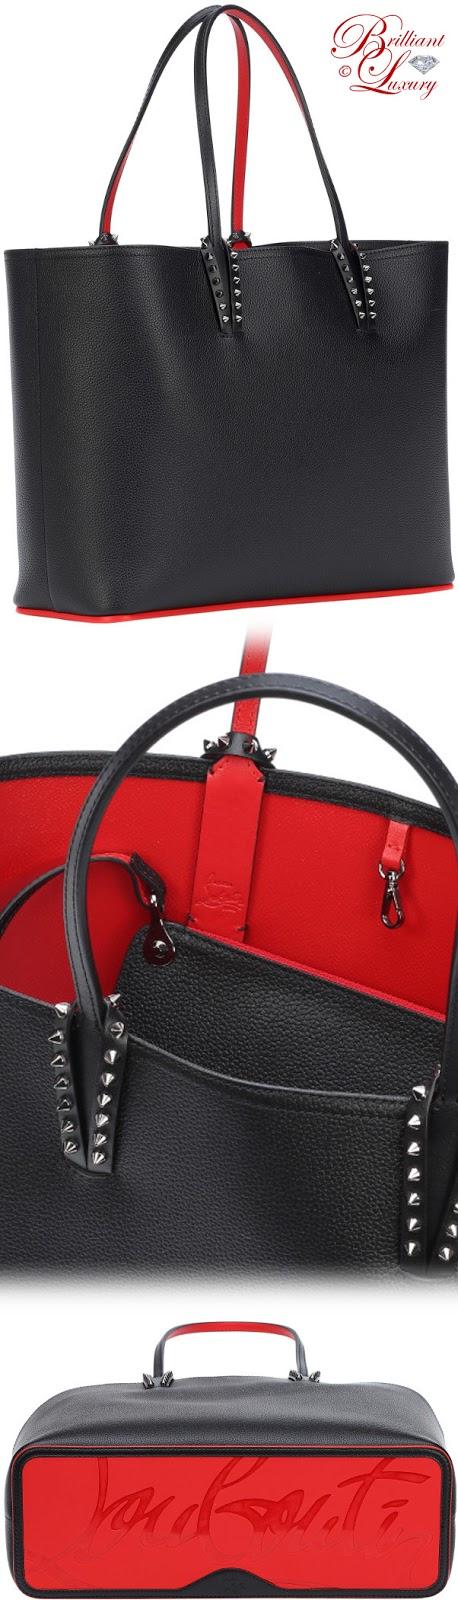 Brilliant Luxury ♦ Christian Louboutin Cabata leather tote in black 2018